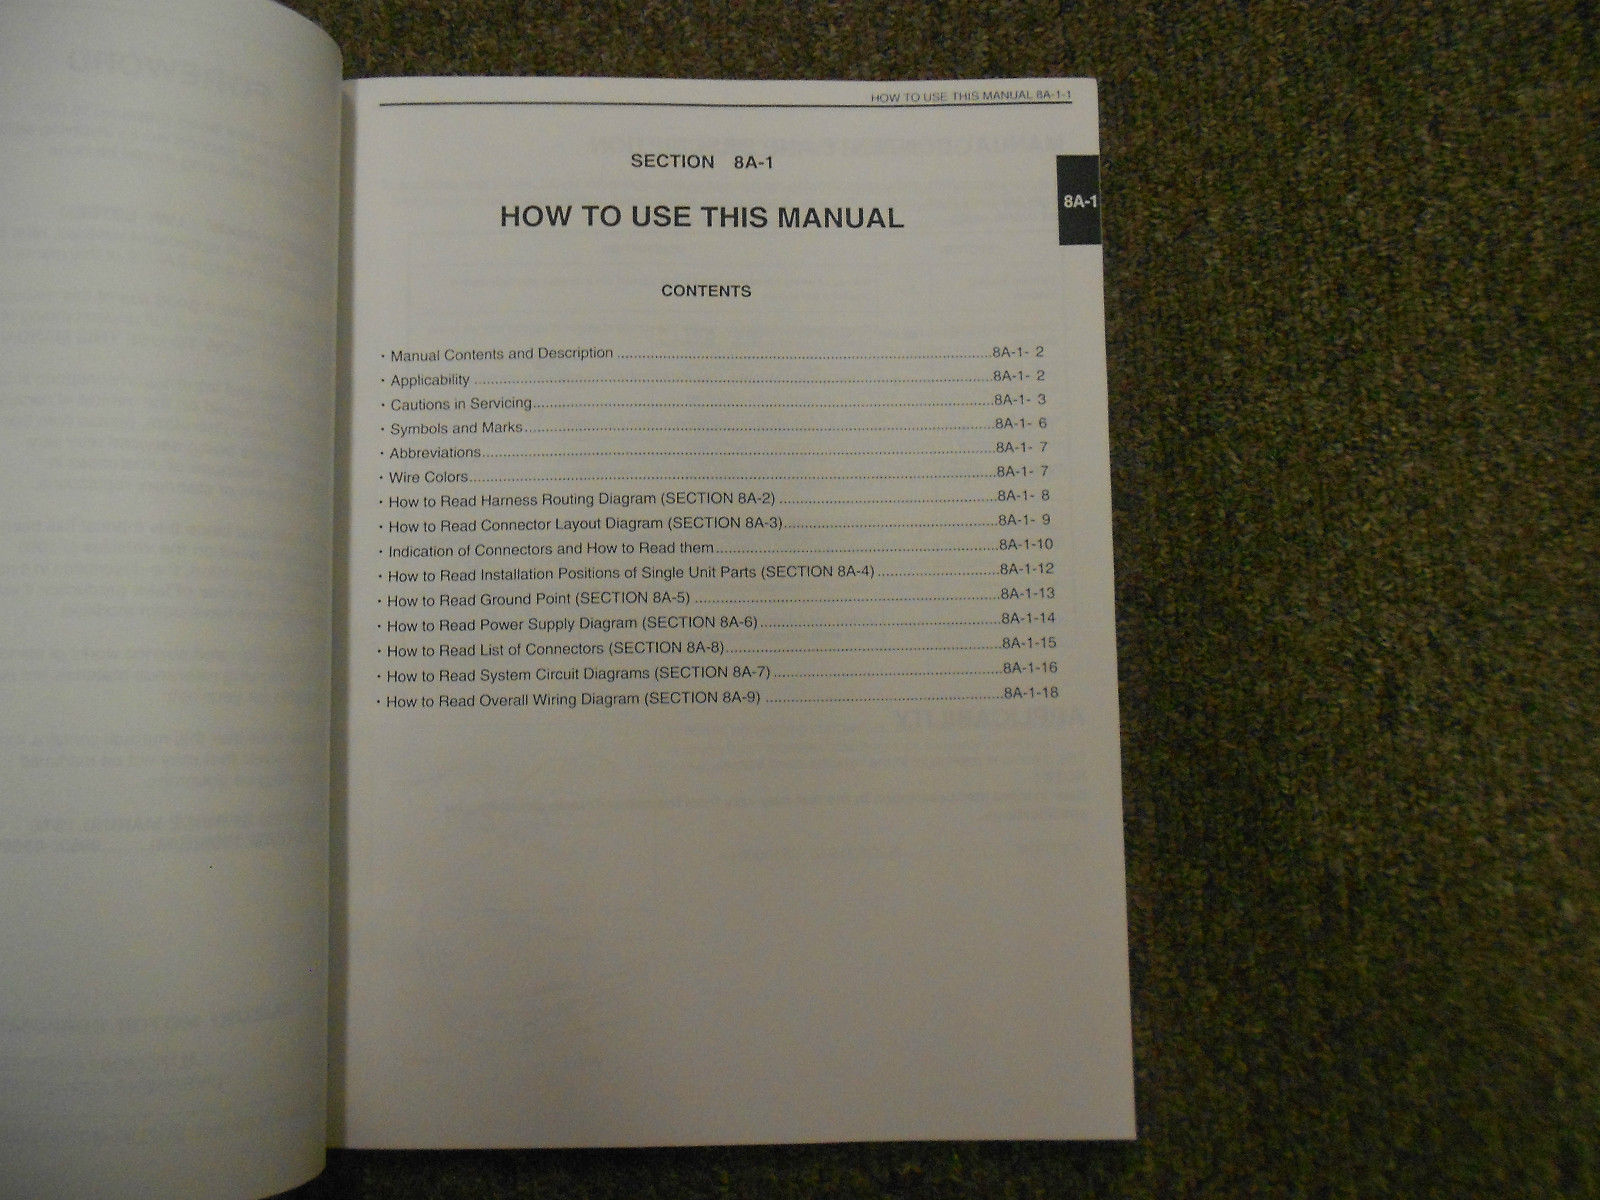 1995 Suzuki Esteem Wiring Diagram Shop And Similar Items 98 Manual Factory Oem Book 95 2nd Ed Us Vol